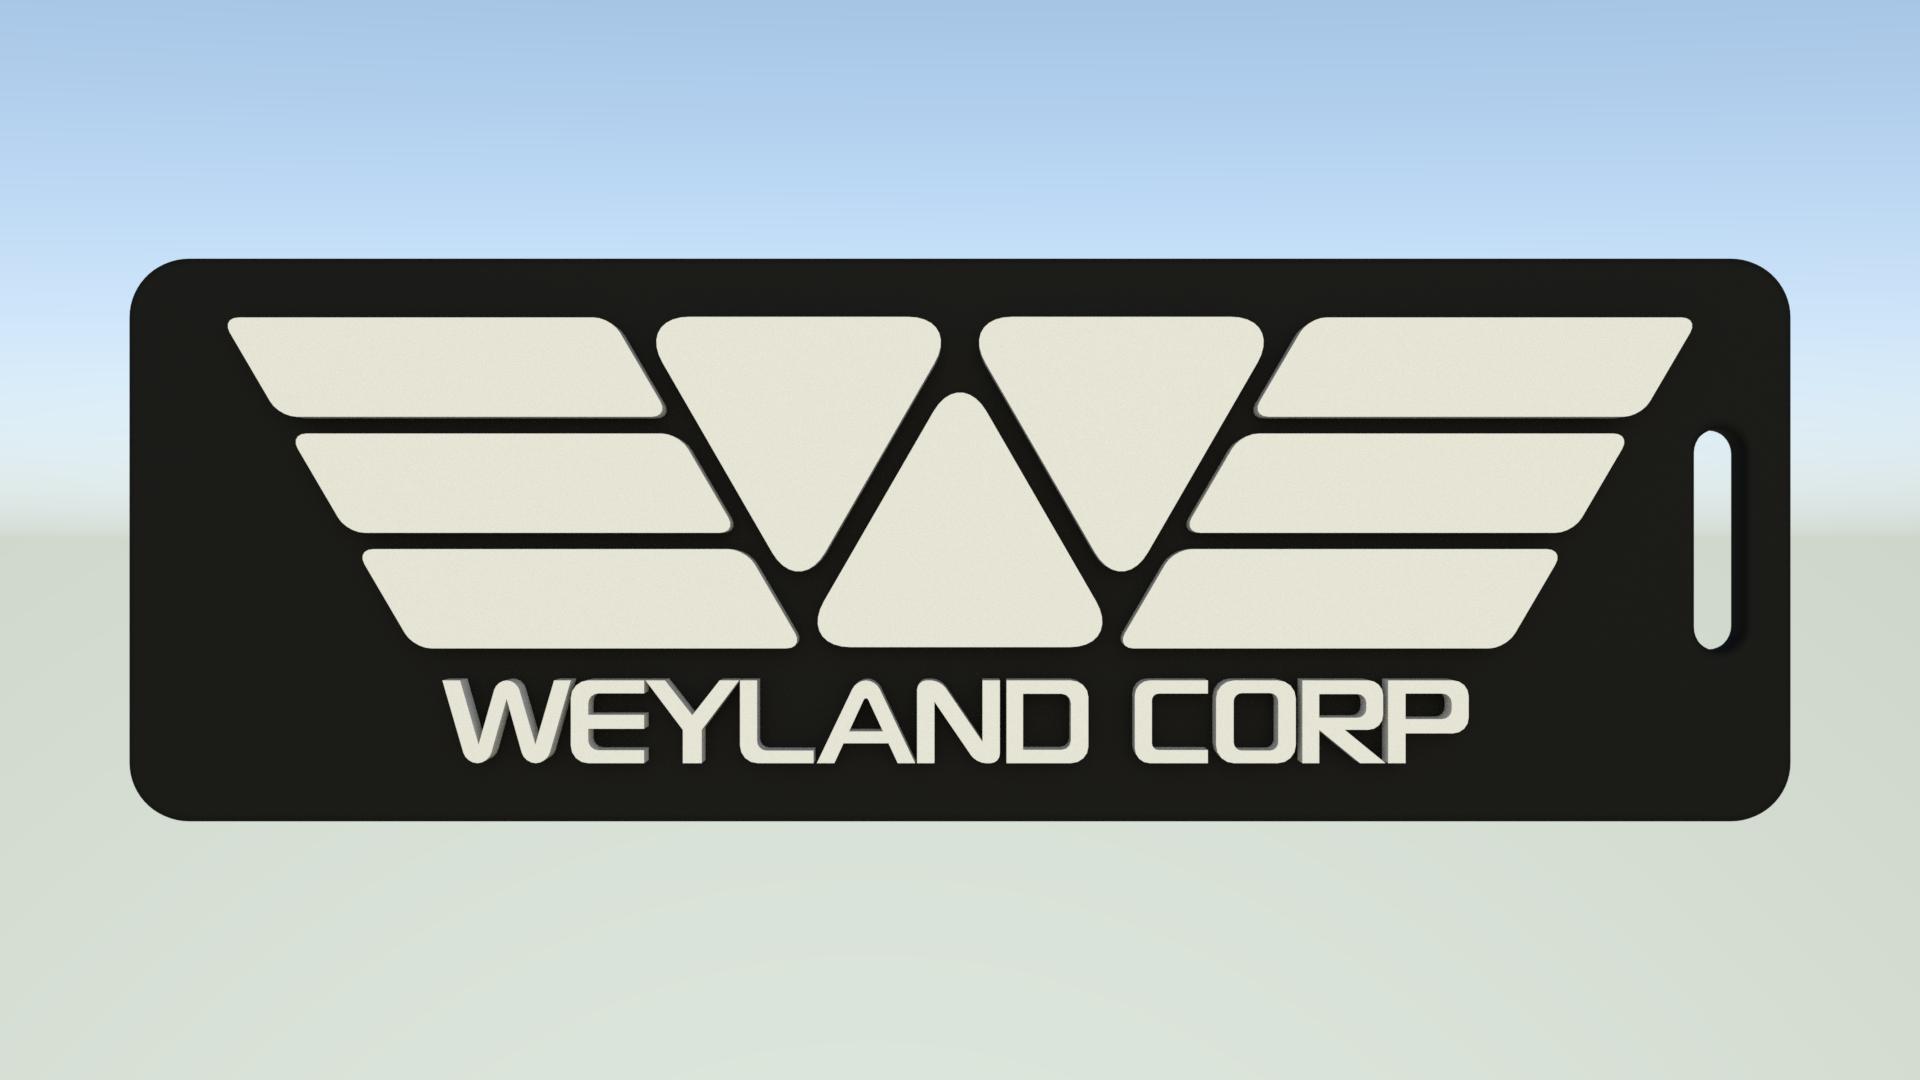 WeylandCorpTag.png Download free STL file Weyland Corporation luggage tag • 3D printer object, Leonidass